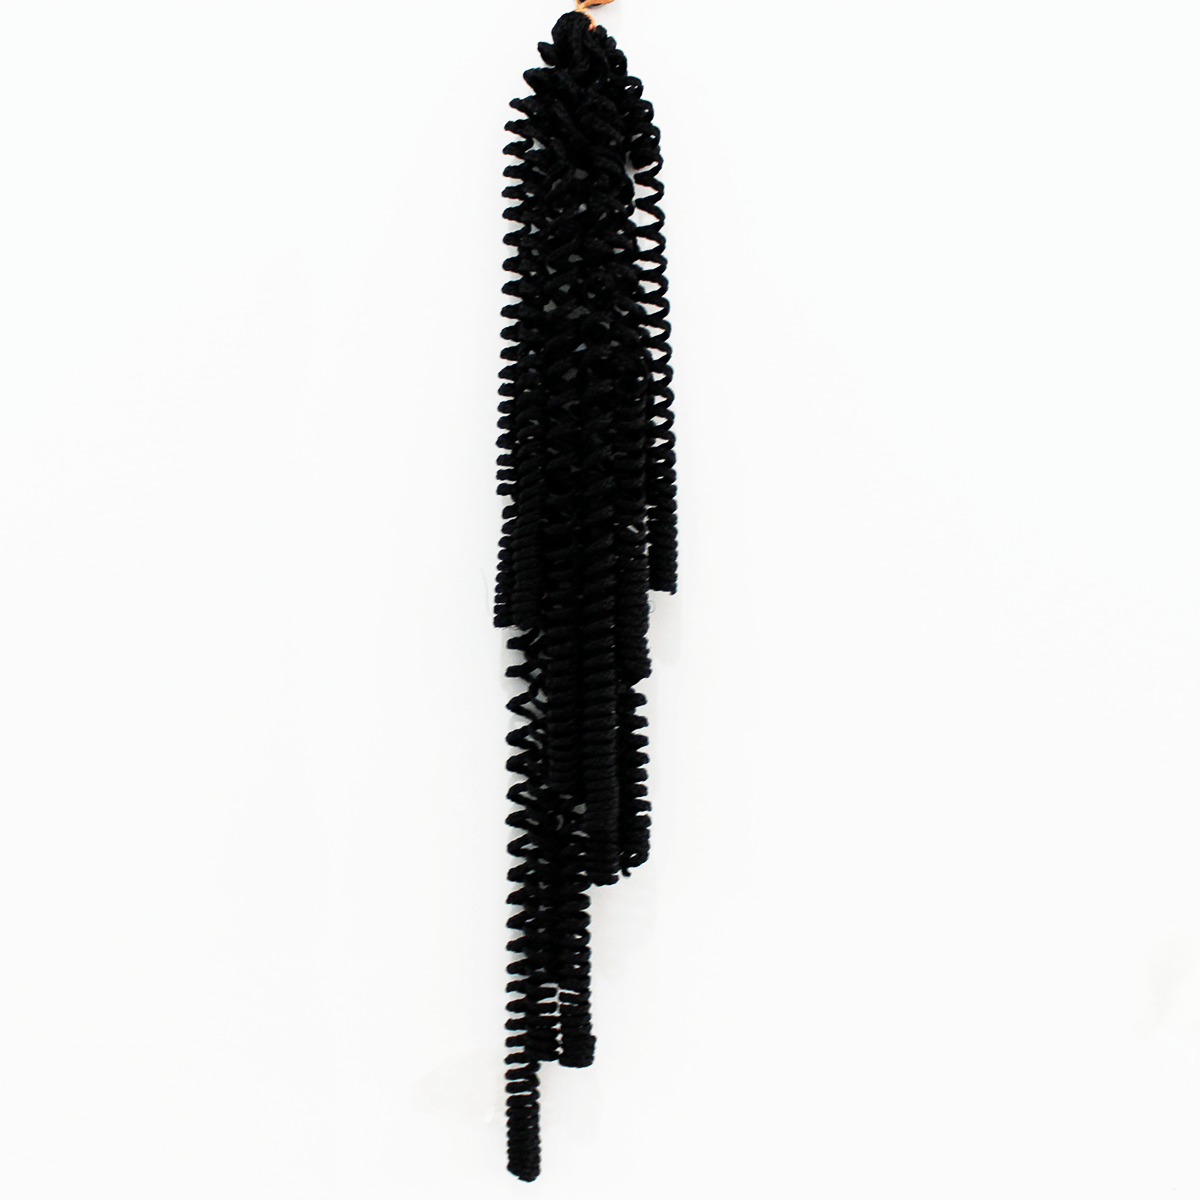 Cabelo Sintético Cacheado Micro Molas - 50cm -  Cor Preto